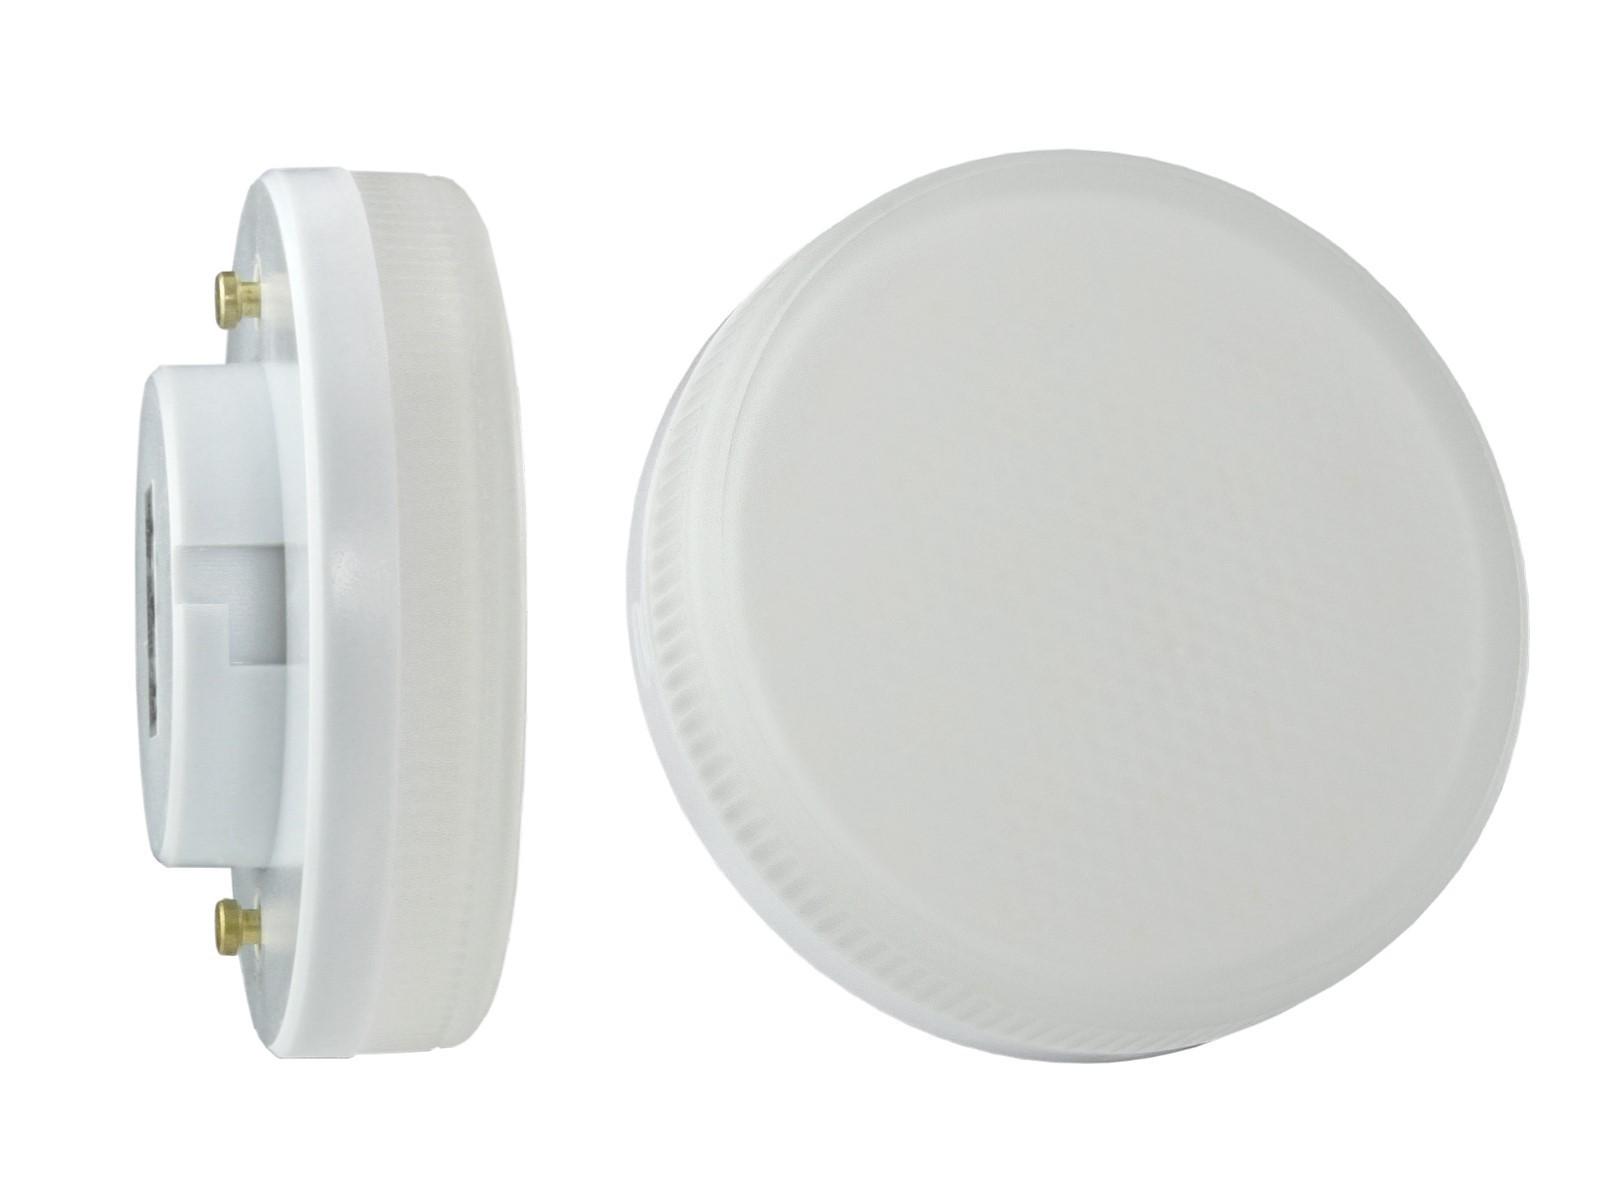 gx53 led leuchtmittel lampe mit 15 smd leds 230 v 3 5w 270 lm tageslicht neutral weiss 120. Black Bedroom Furniture Sets. Home Design Ideas